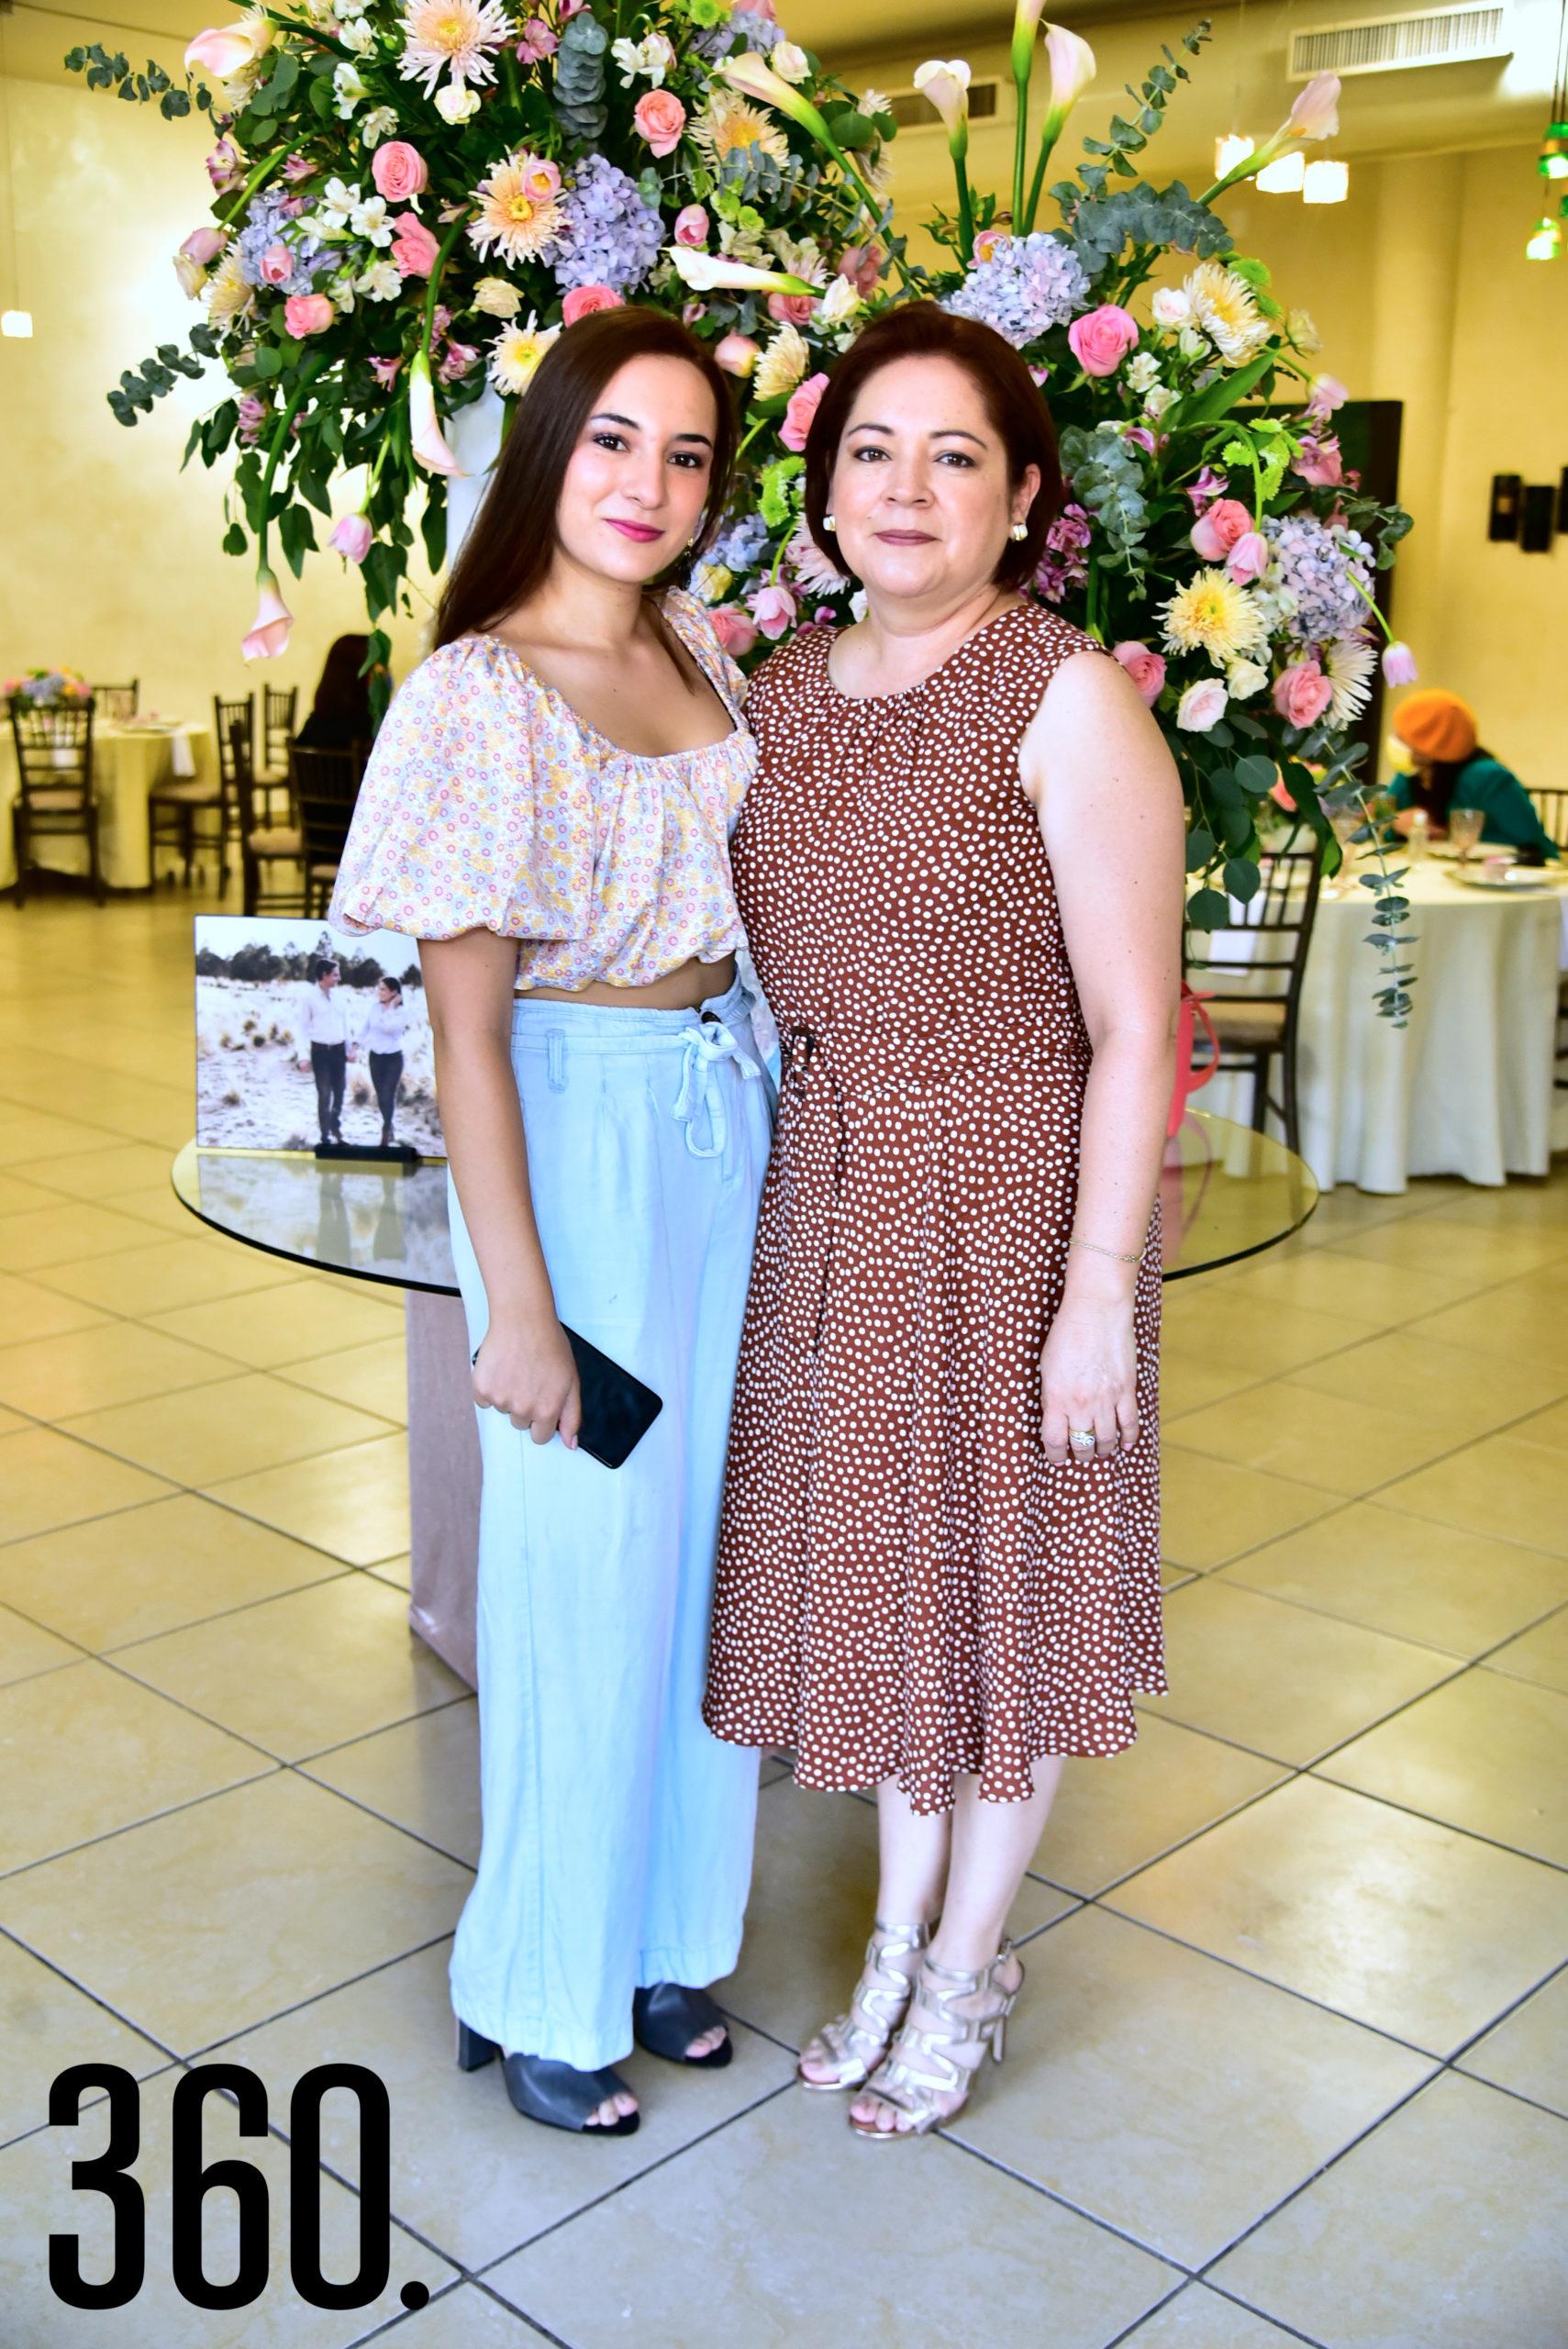 Karla Saucedo y Cecilia Saucedo.